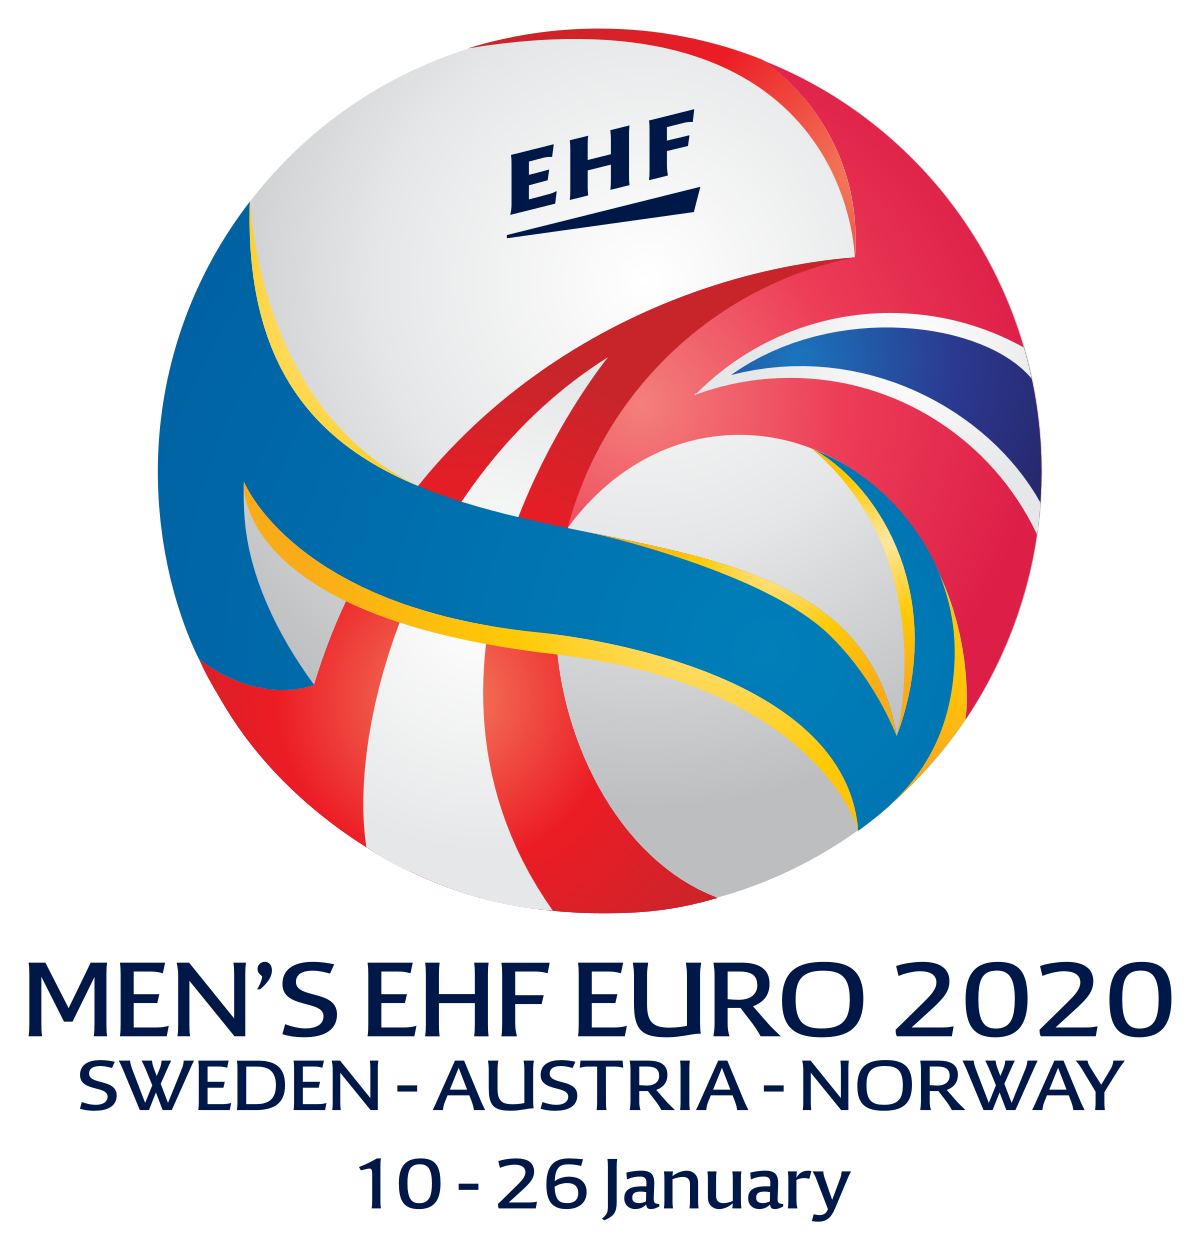 Le groupe TF1 et beIN Sports diffuseront les championnats d'Europe EHF de Handball